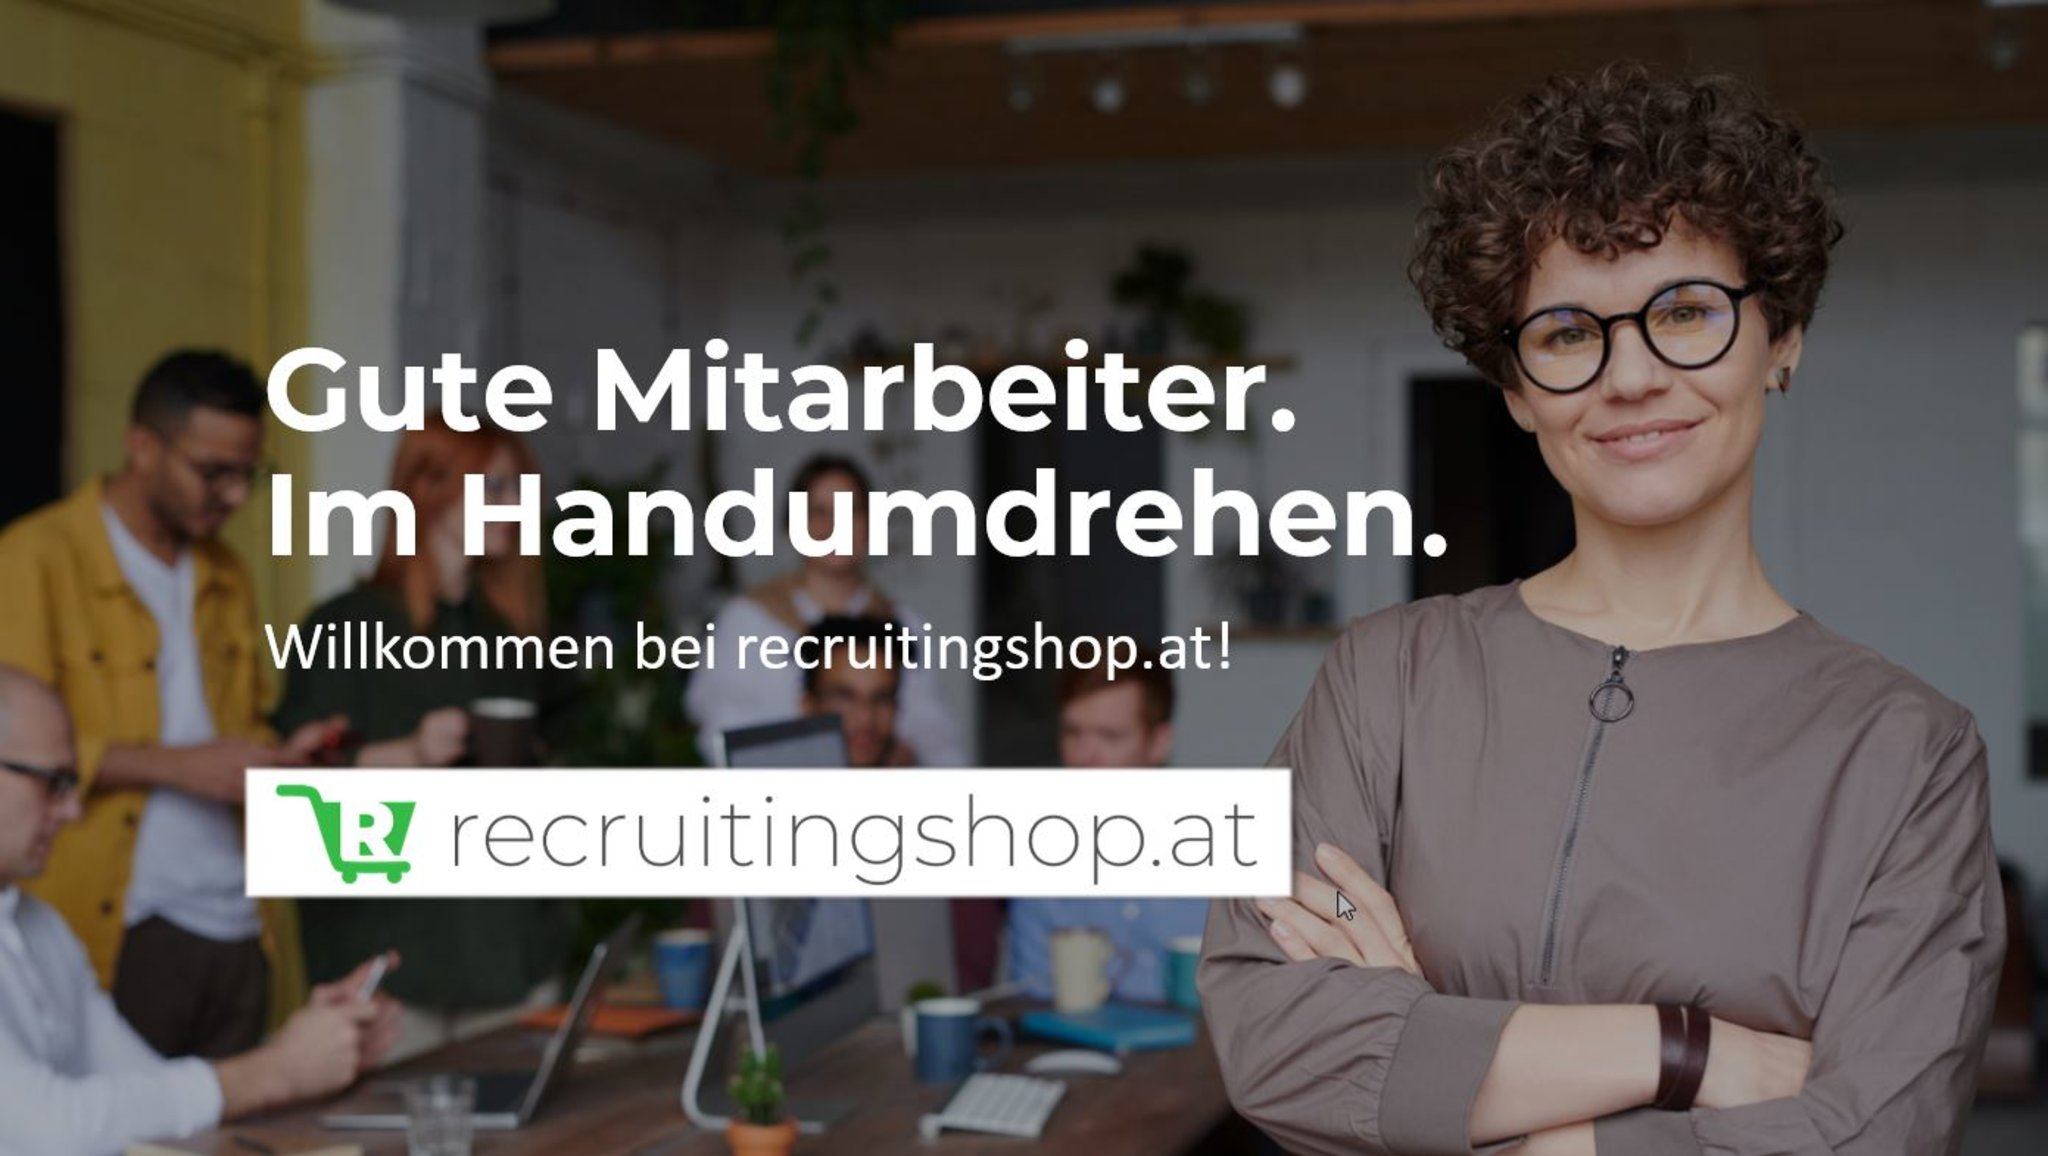 Online-Recruiting leicht gemacht mit recruitingshop.at